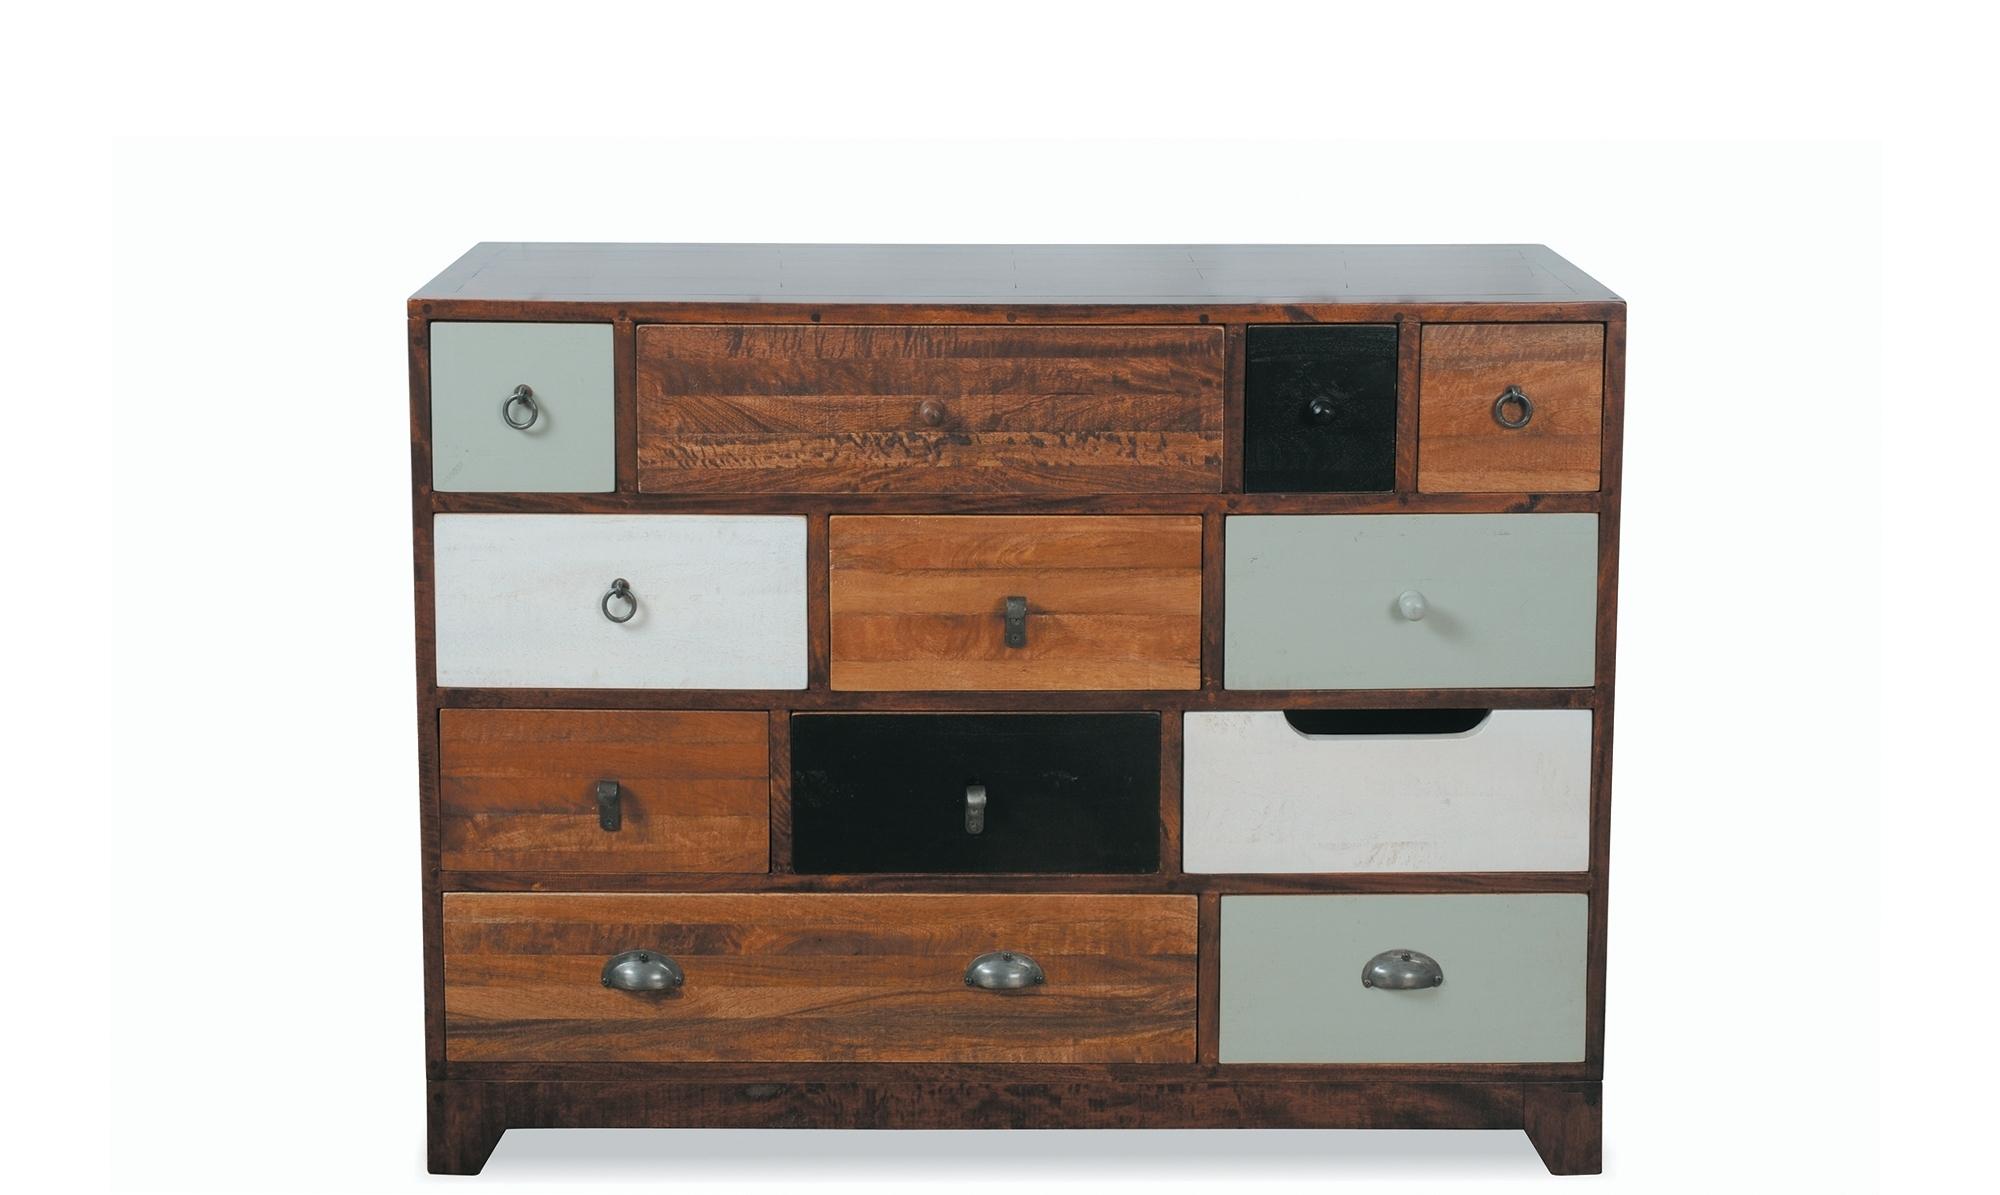 Sideboards - Modern, Oak & Pine Sideboards - Fishpools regarding Dark Smoked Oak With White Marble Top Sideboards (Image 20 of 30)